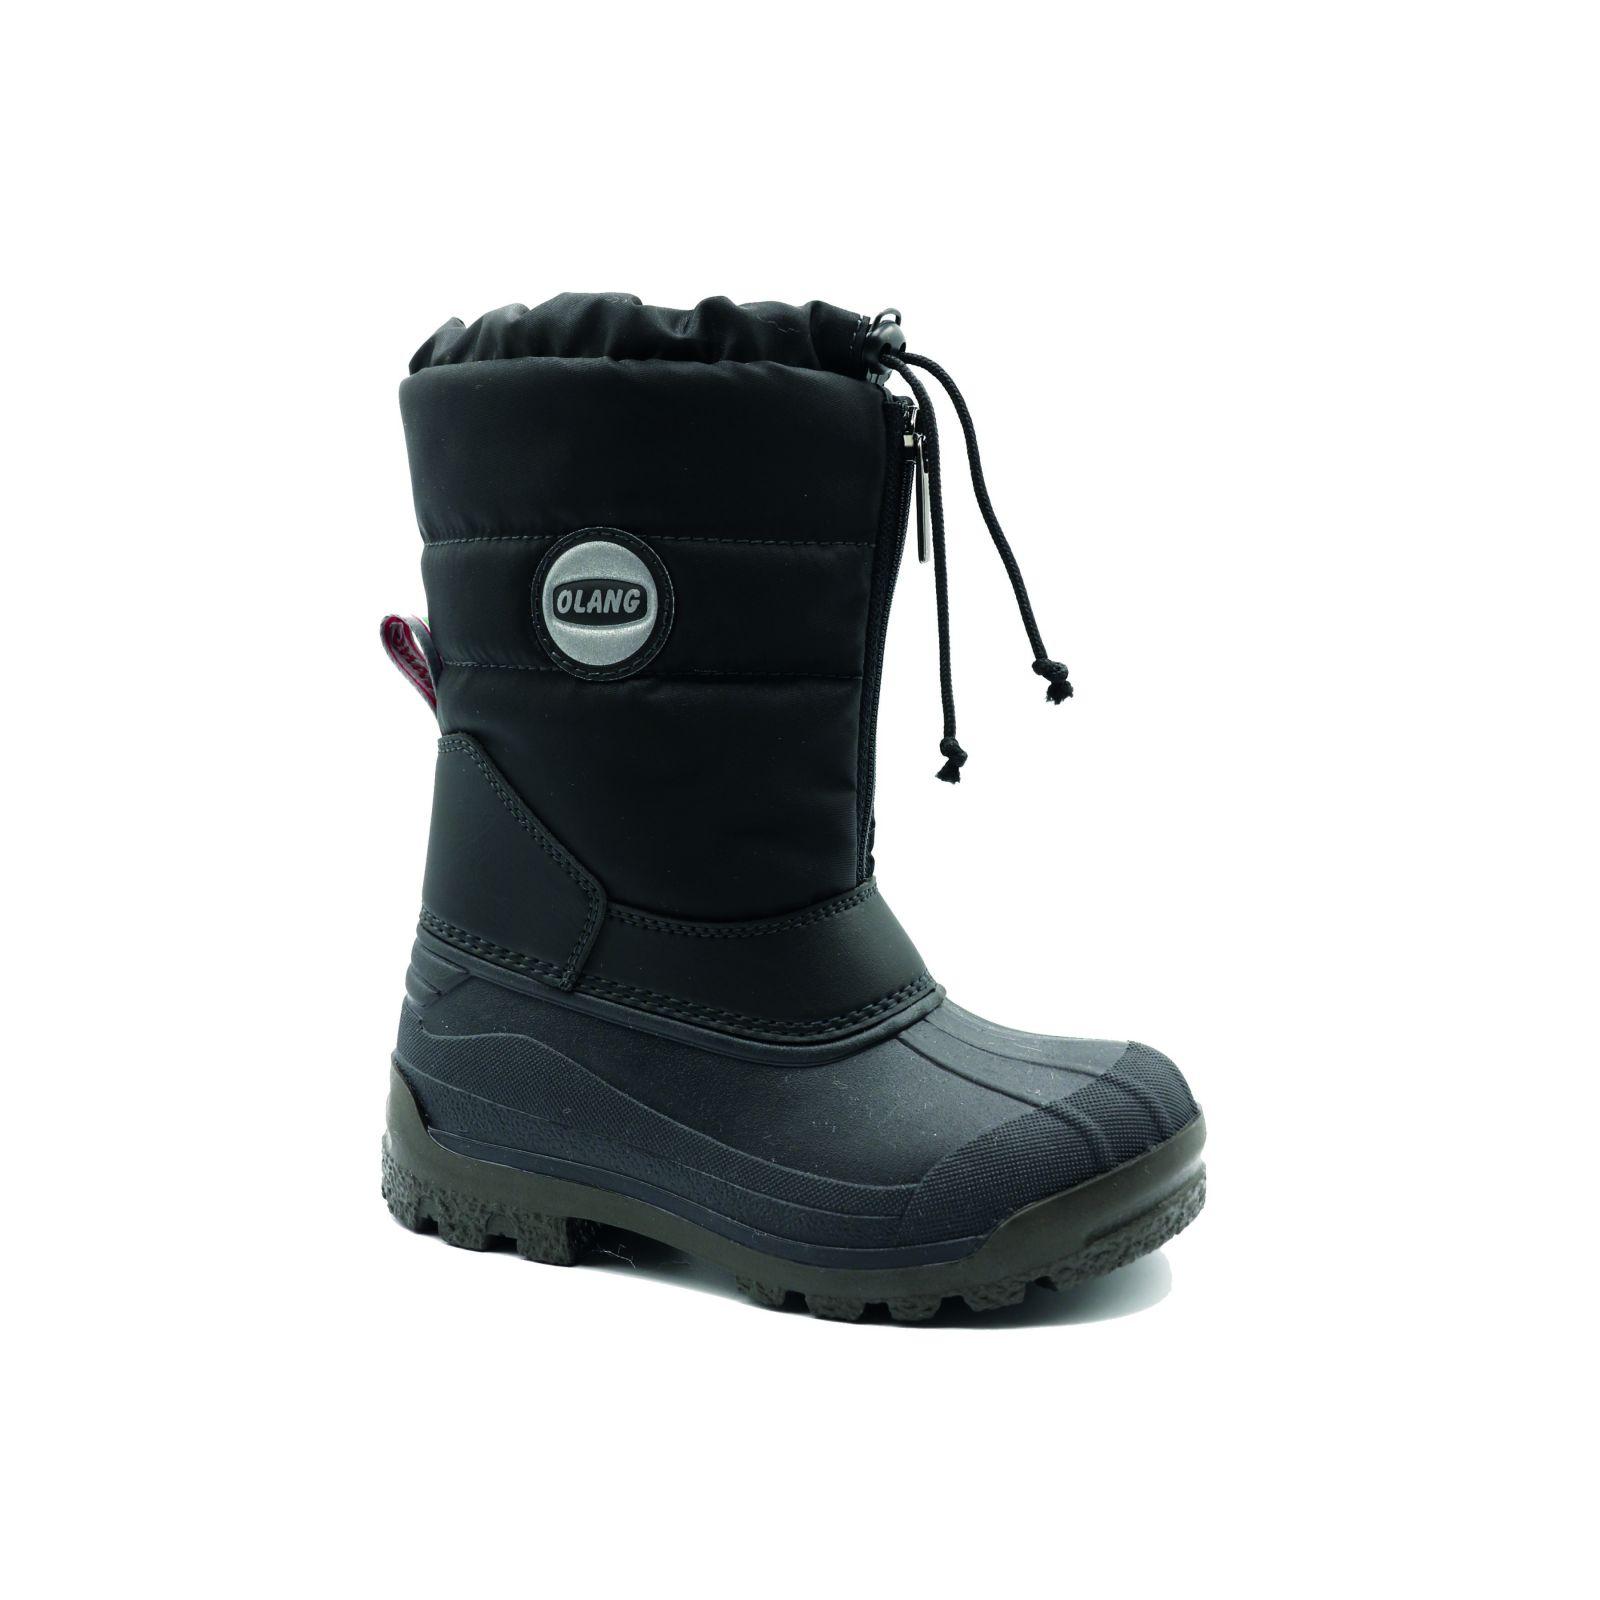 Outdoorix - Olang Volpe Nero zimní obuv